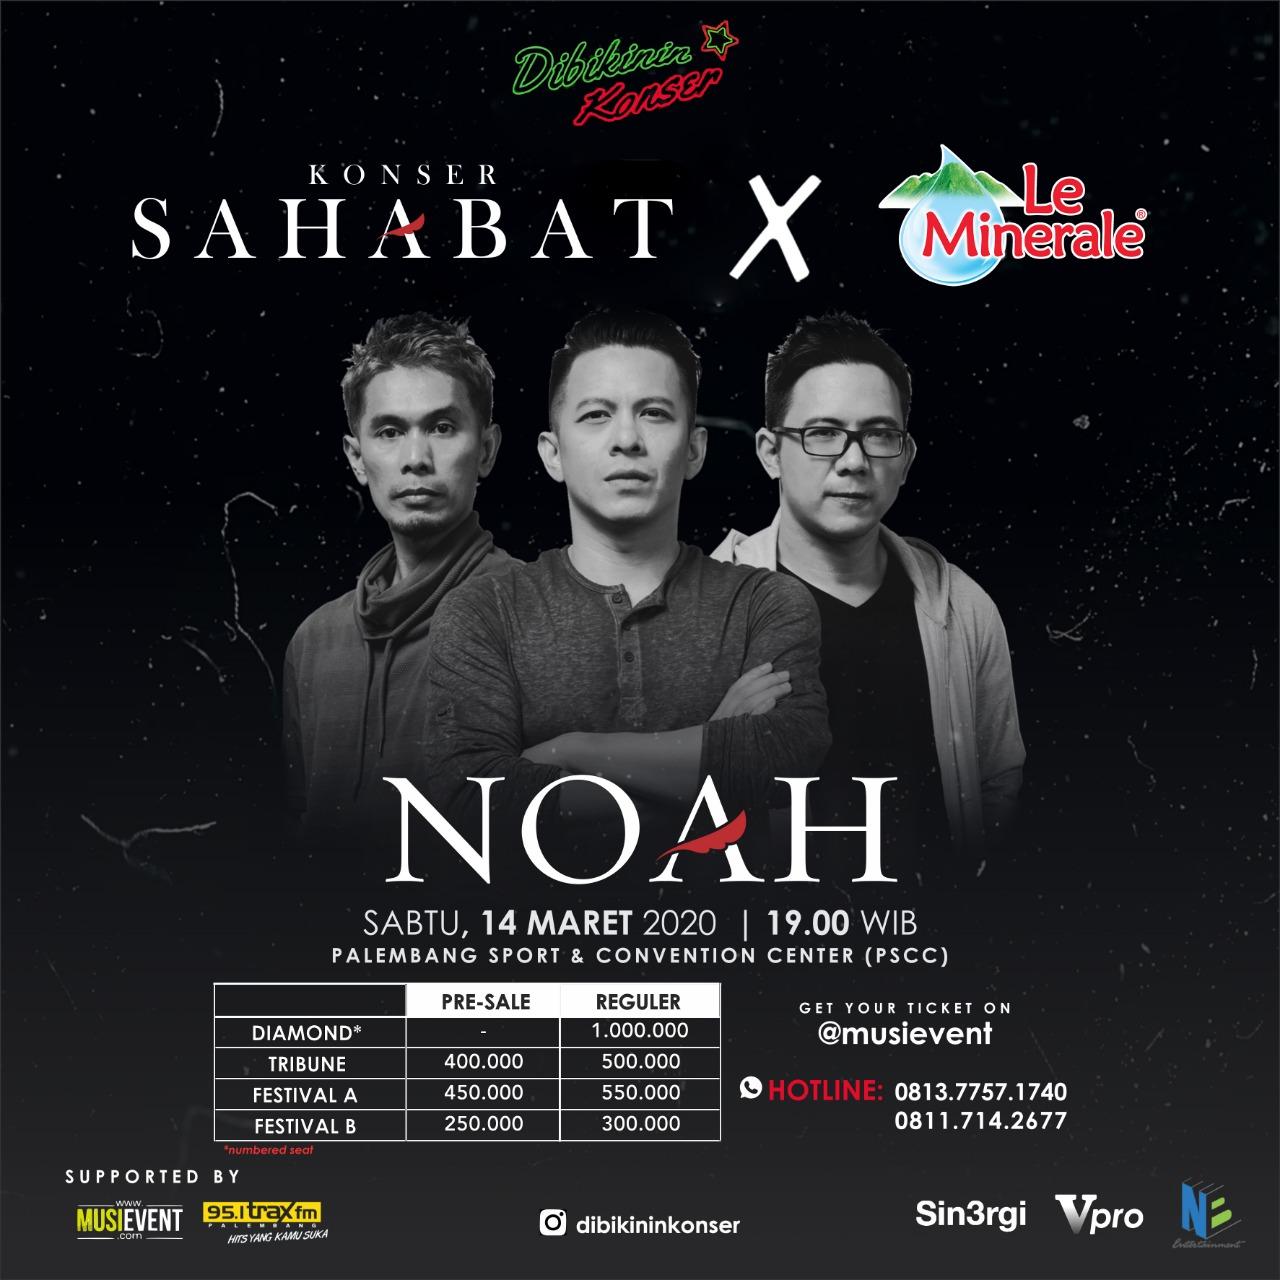 Konser Sahabat x Le Minerale, Palembang 2020